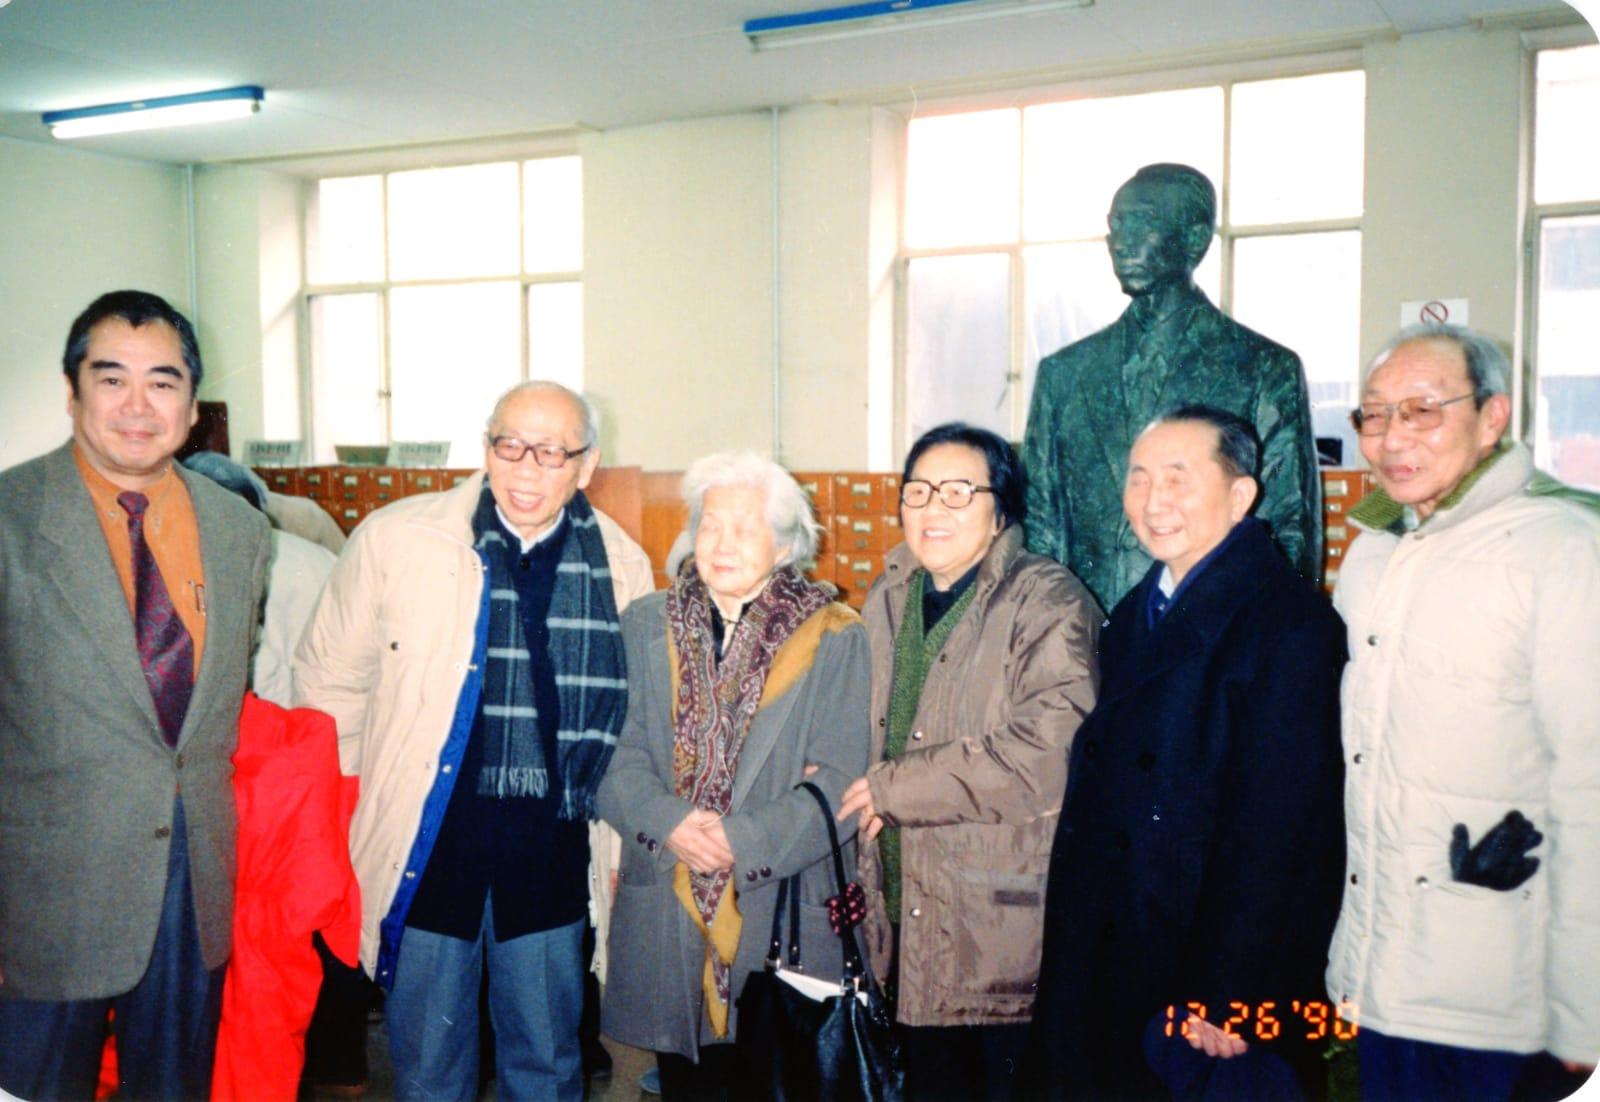 1990, Unveiling ceremony of Hsiao Yu-mei's bronze statue 1990年蕭友梅博士銅像揭幕典禮